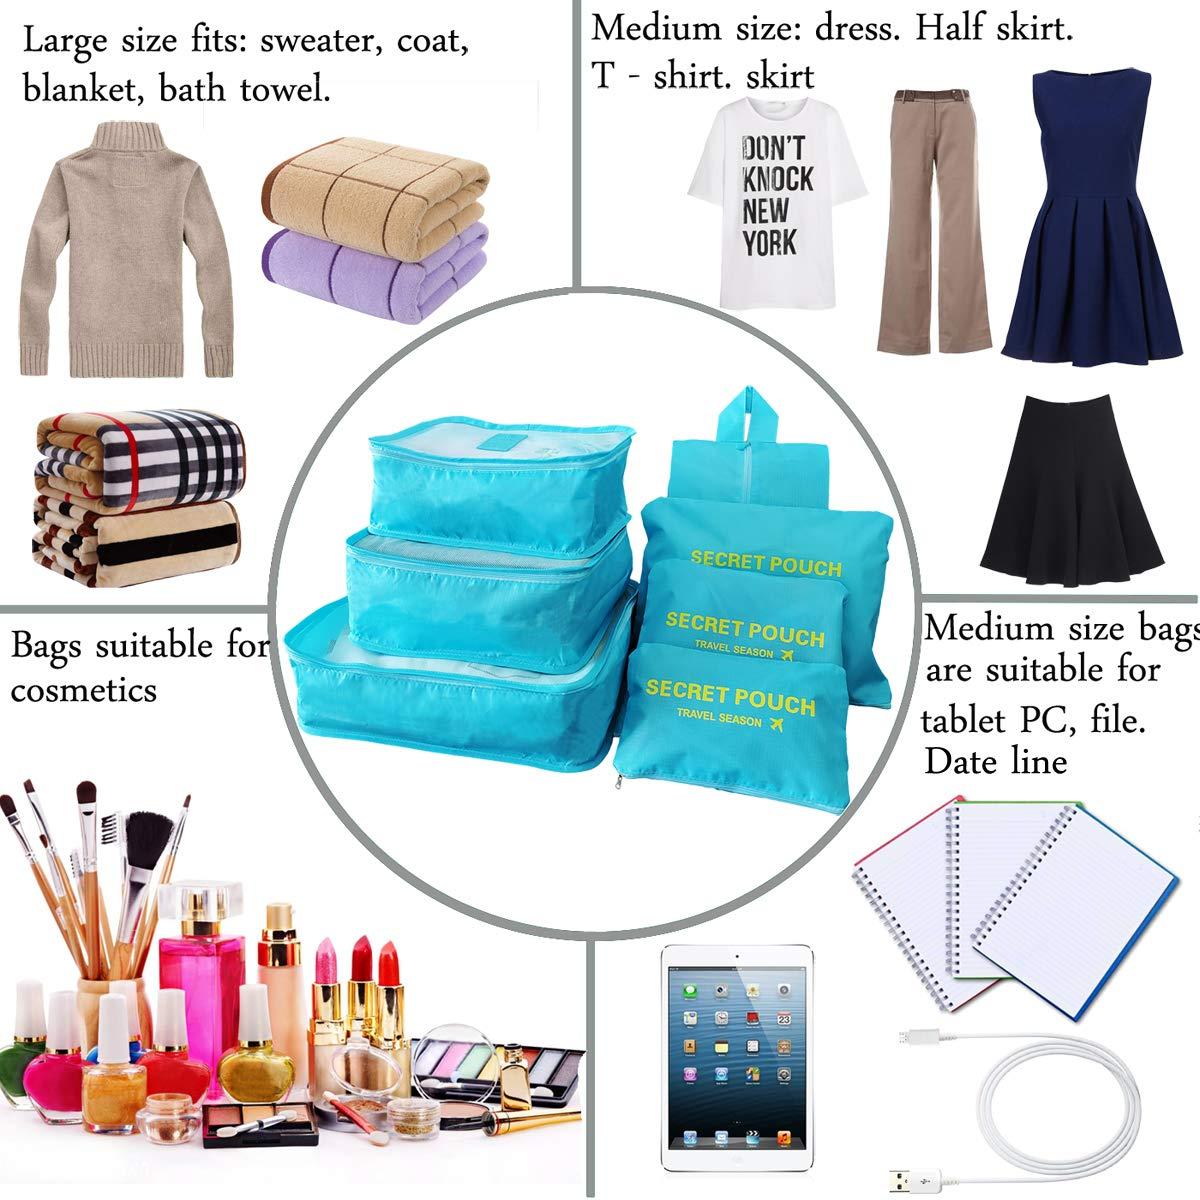 Sackorange 7 Set Travel Storage Bags Packing cubes Multi-functional Clothing Sorting Packages,Travel Packing Pouches,Luggage Organizer